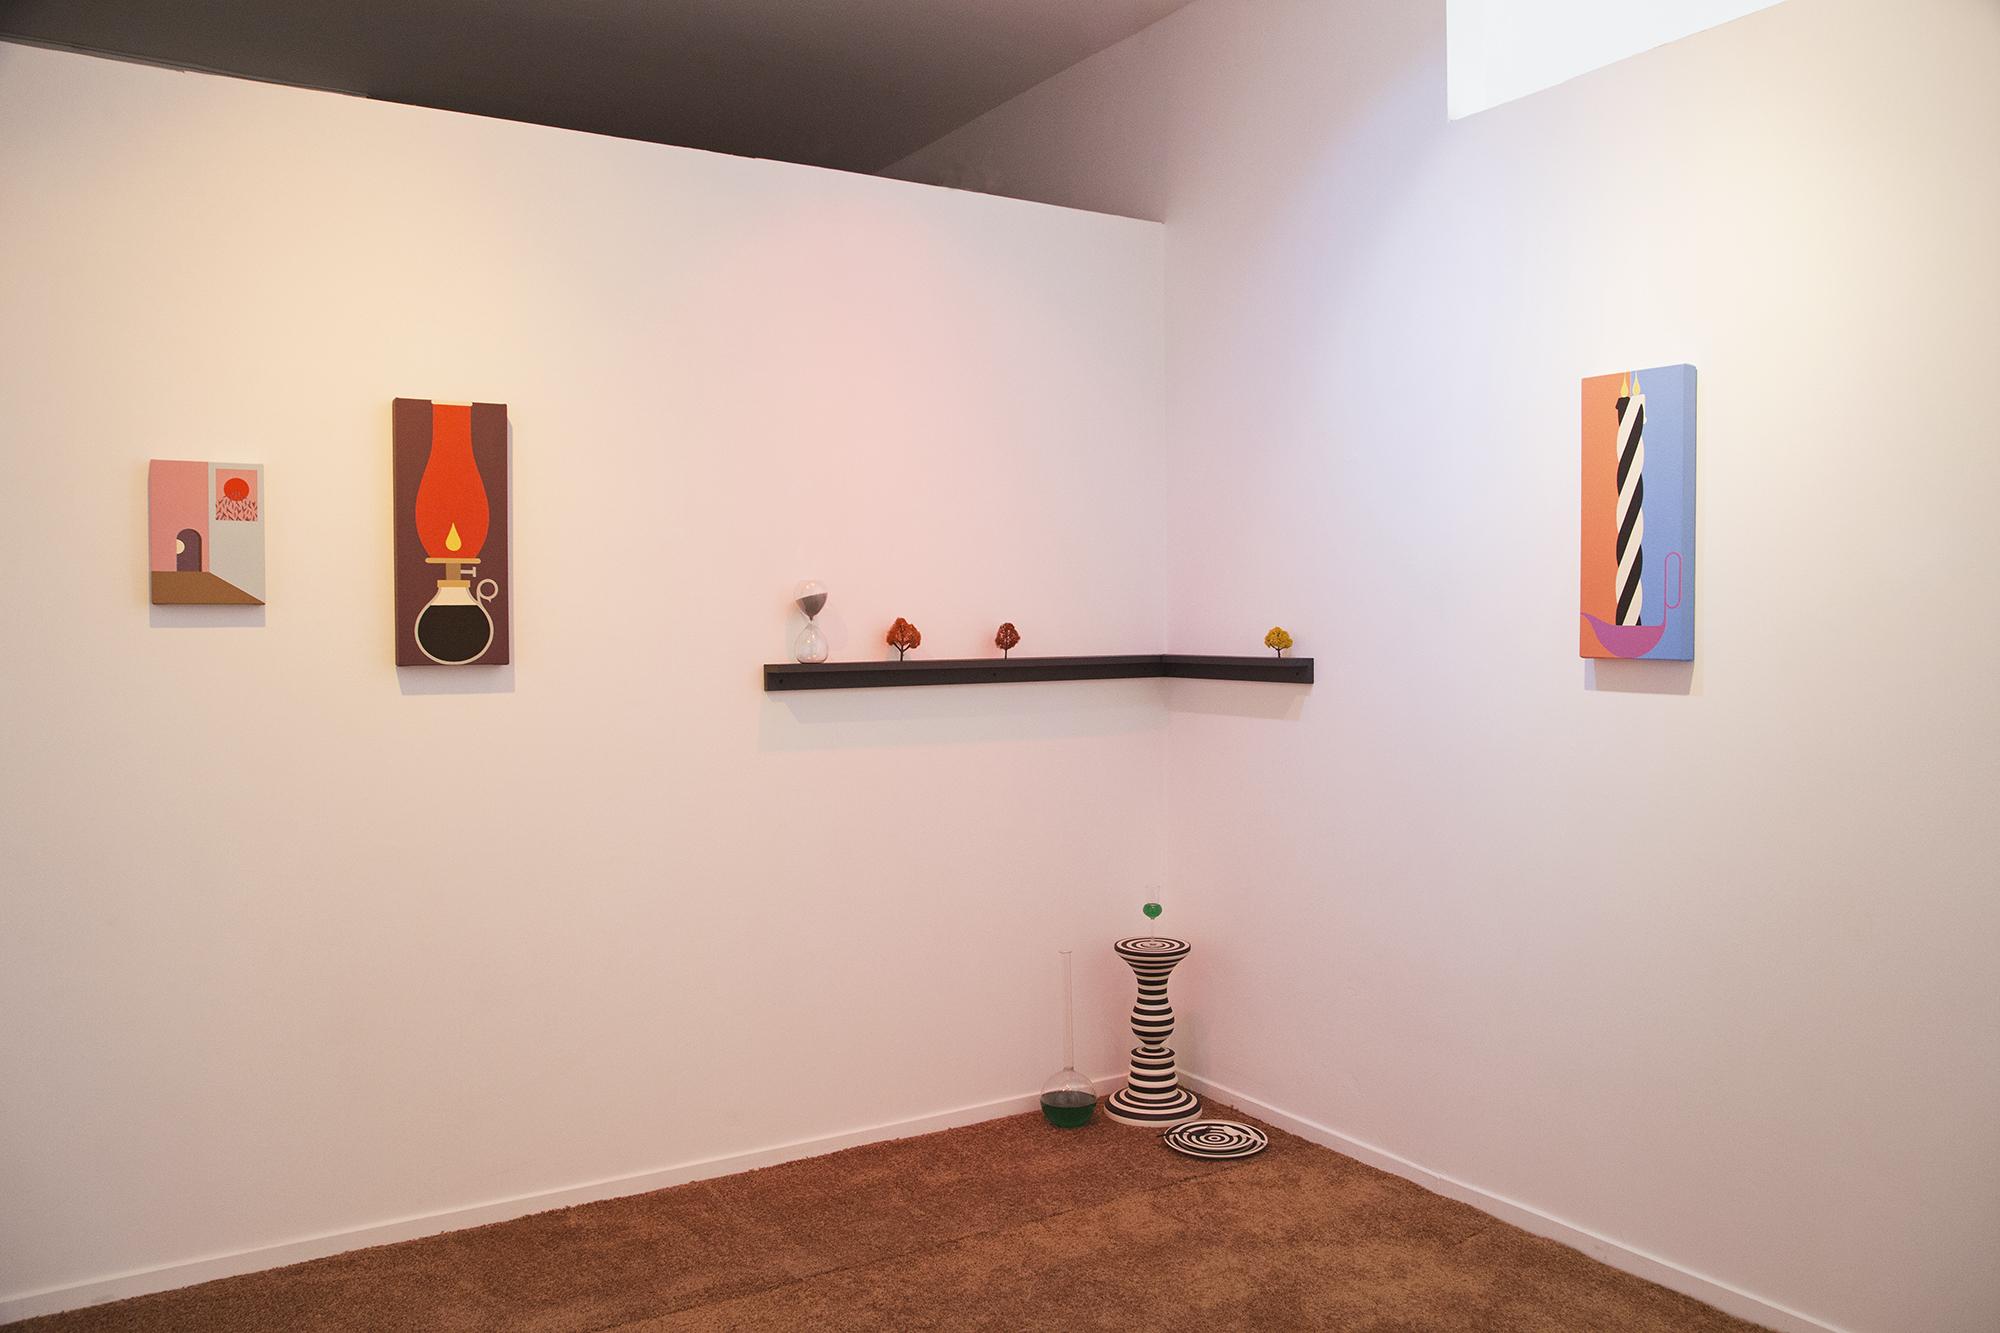 Greg Ito art exhibition at Public Land art gallery in Sacramento